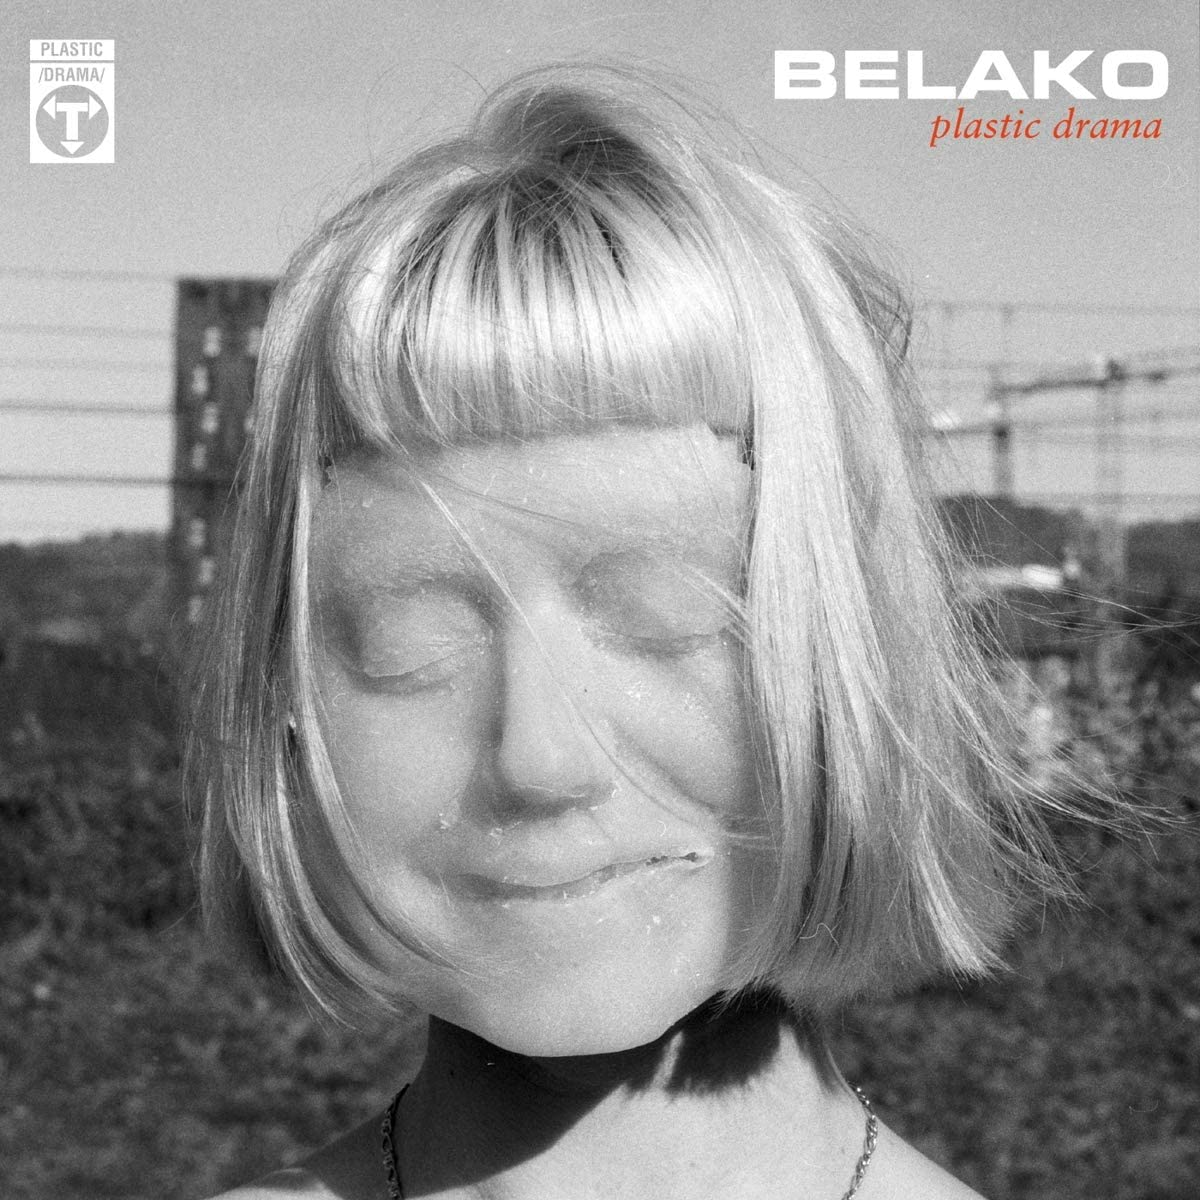 Copertina Vinile 33 giri Plastic Drama di Belako